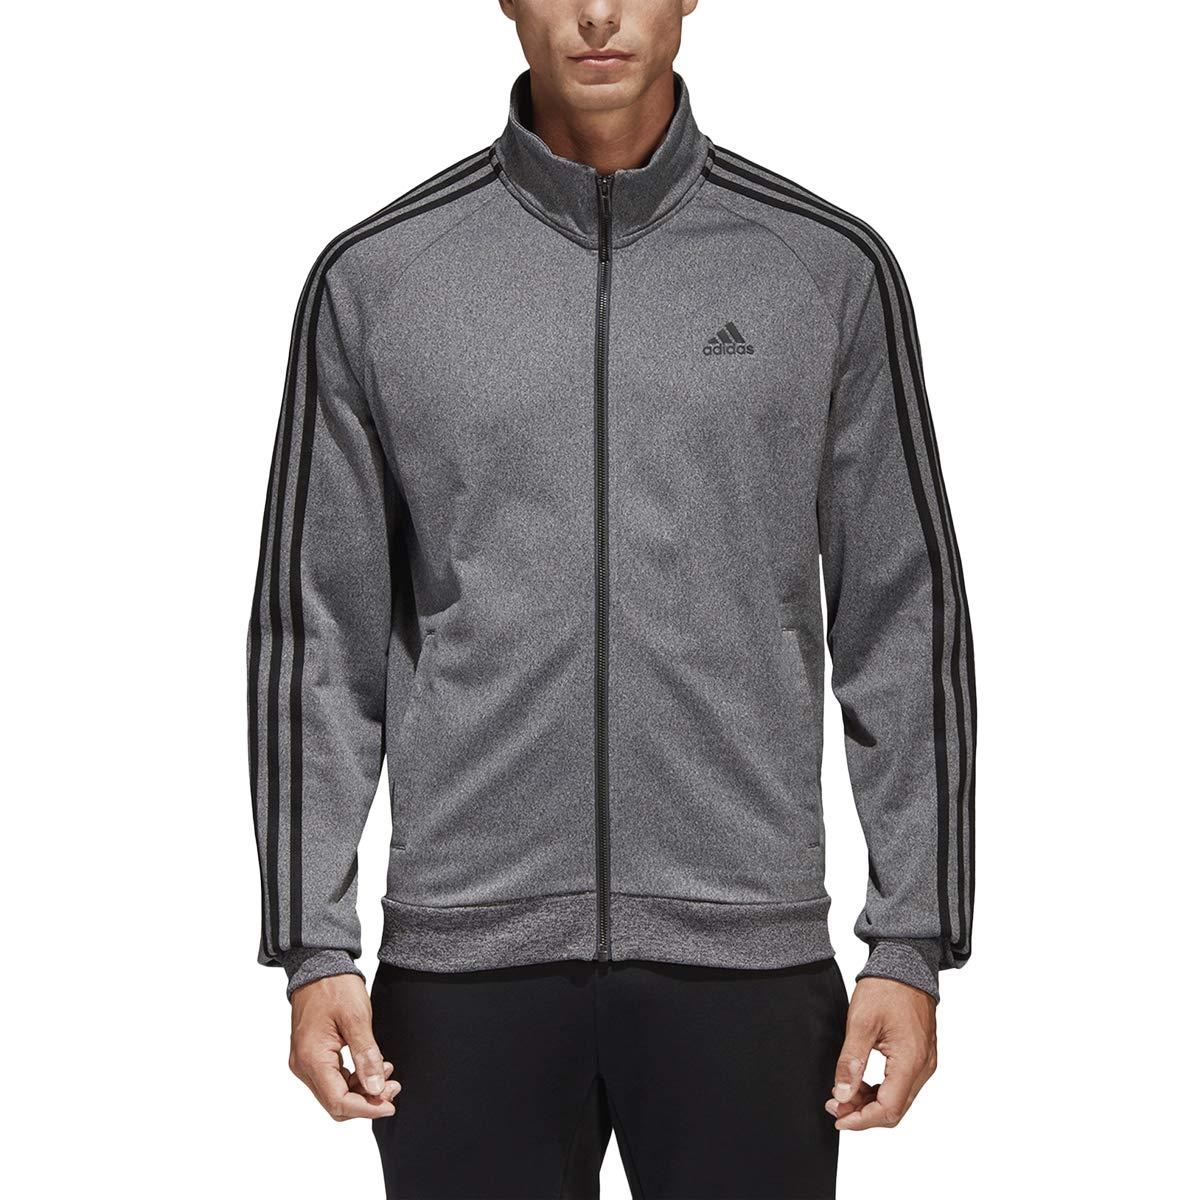 9985f6a3ffed2 adidas Men's Essentials 3-Stripe Tricot Track Jacket, Dark Grey/Black,  XX-Large